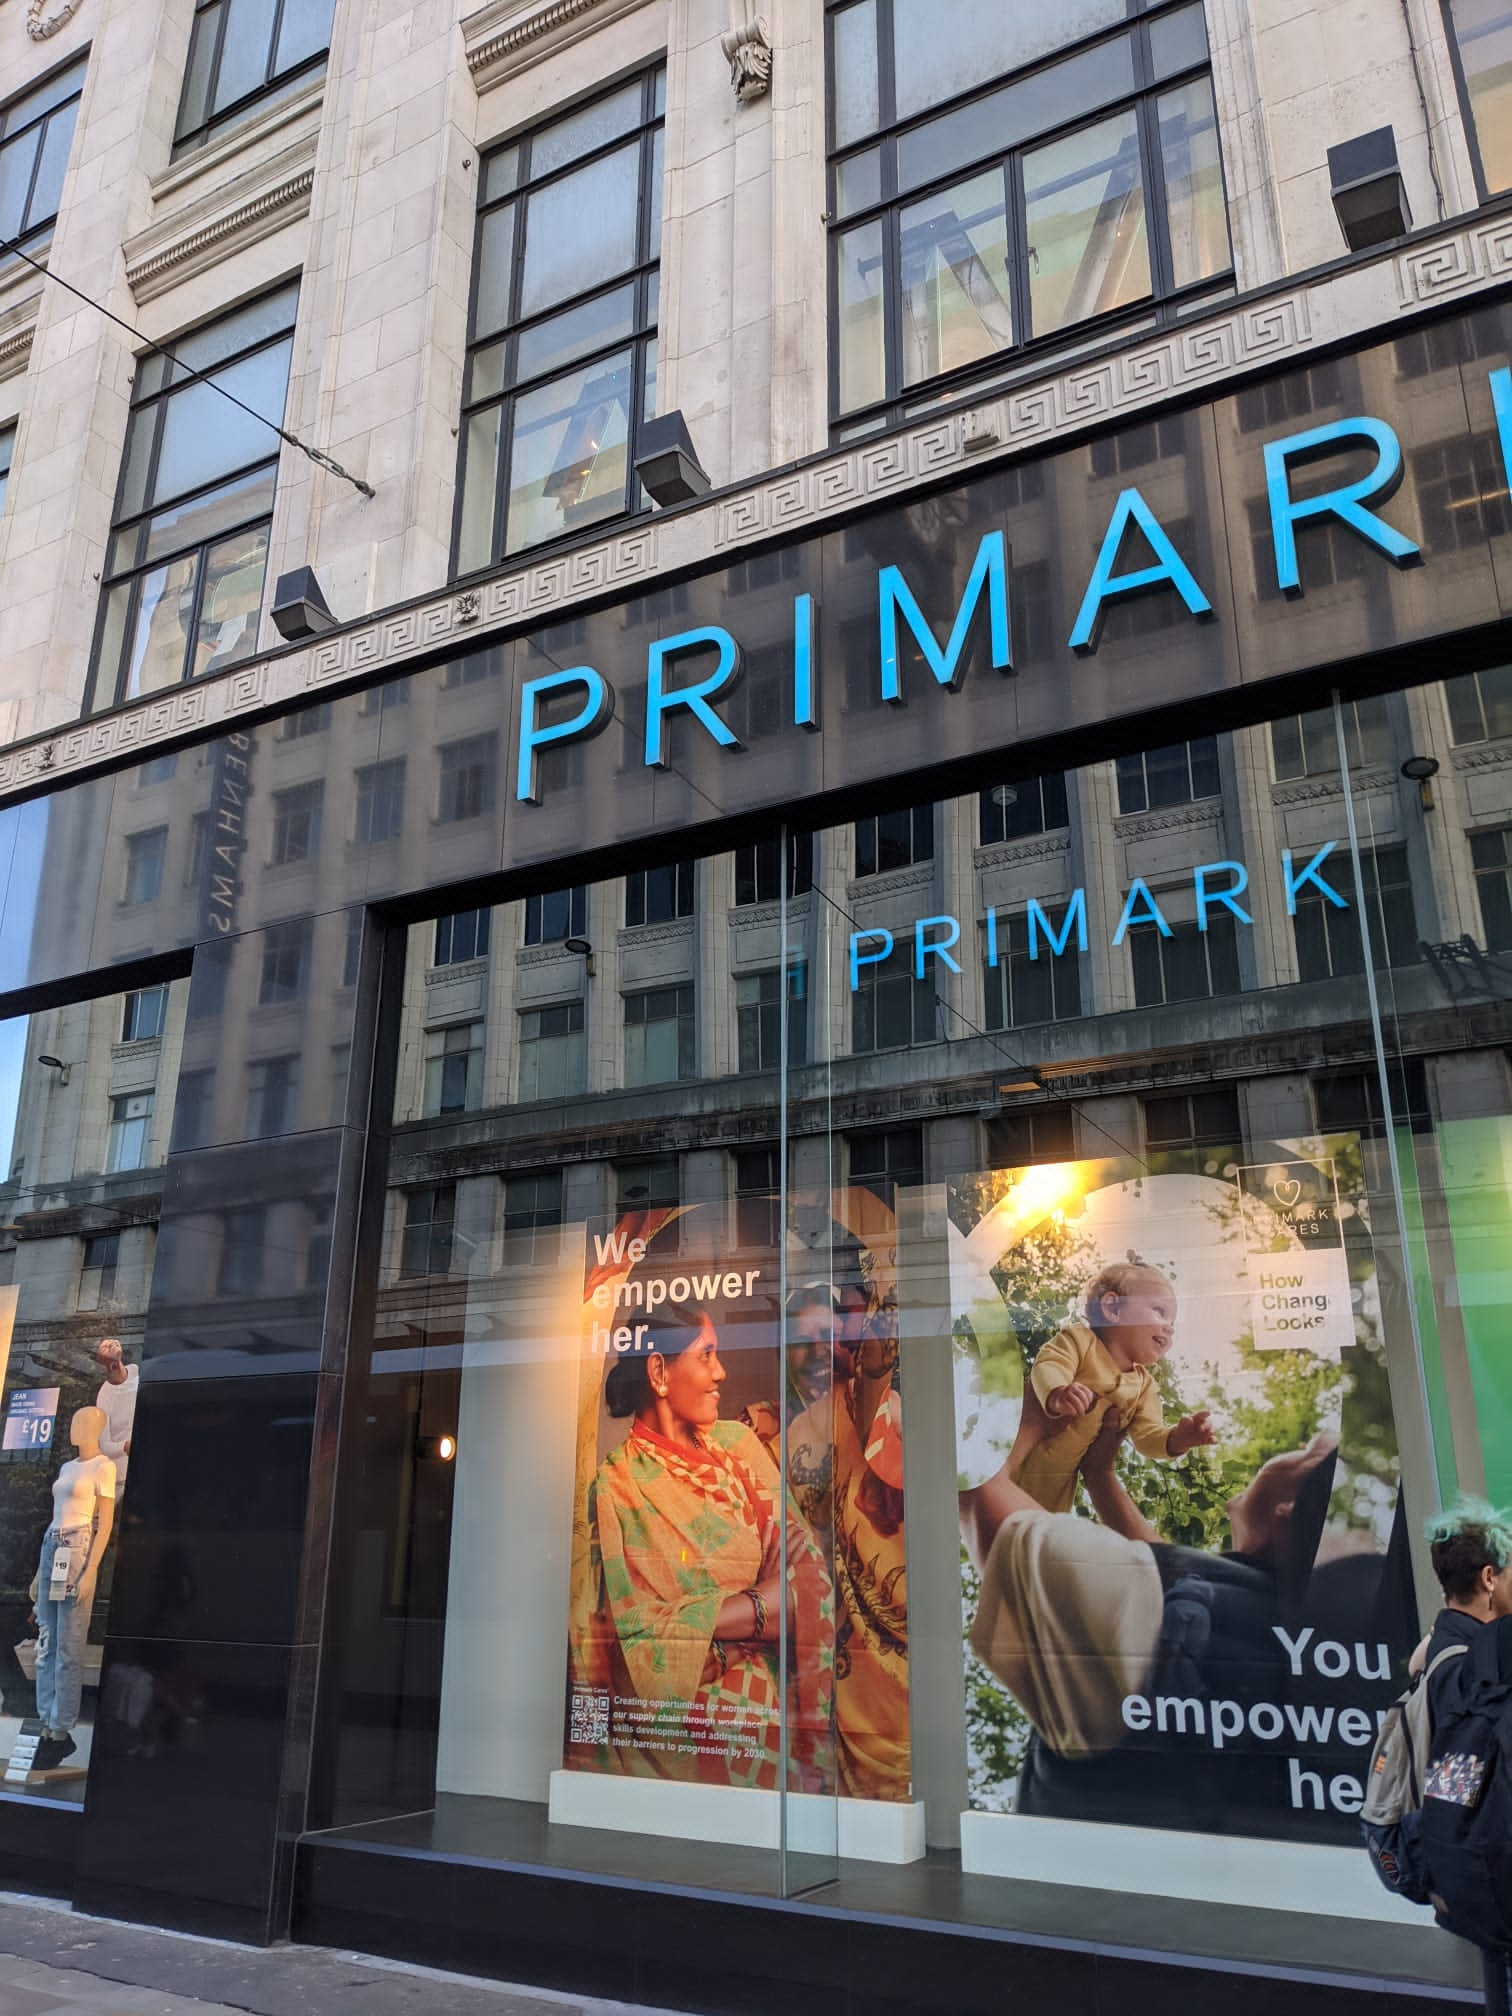 Manchester Primark buys fresh produce